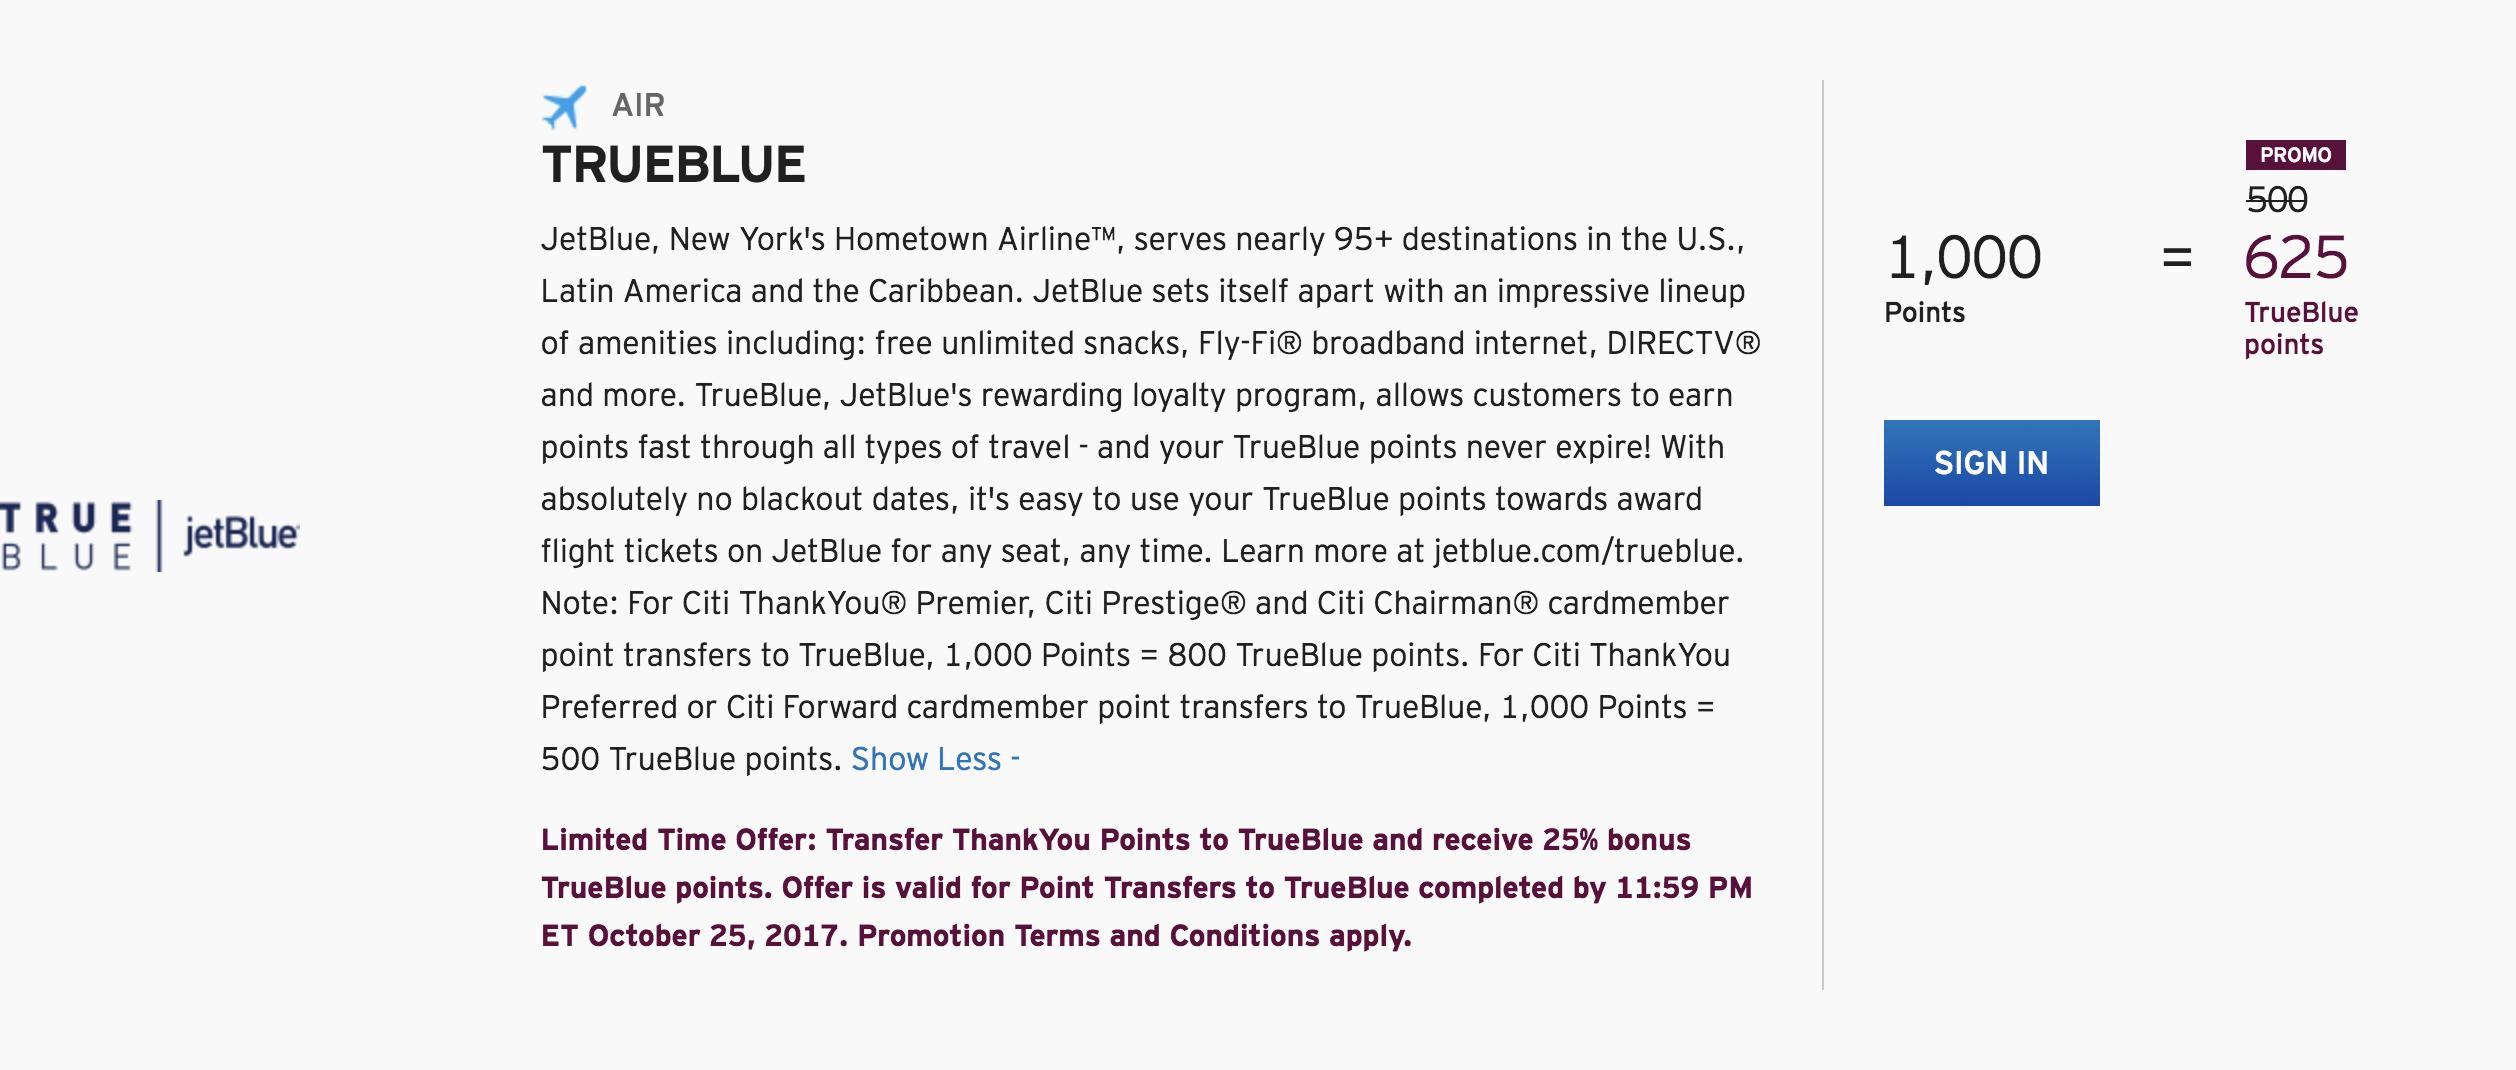 JetBlue TrueBlue 25 Percent Transfer Bonus from ThankYou Points through October 25 2017